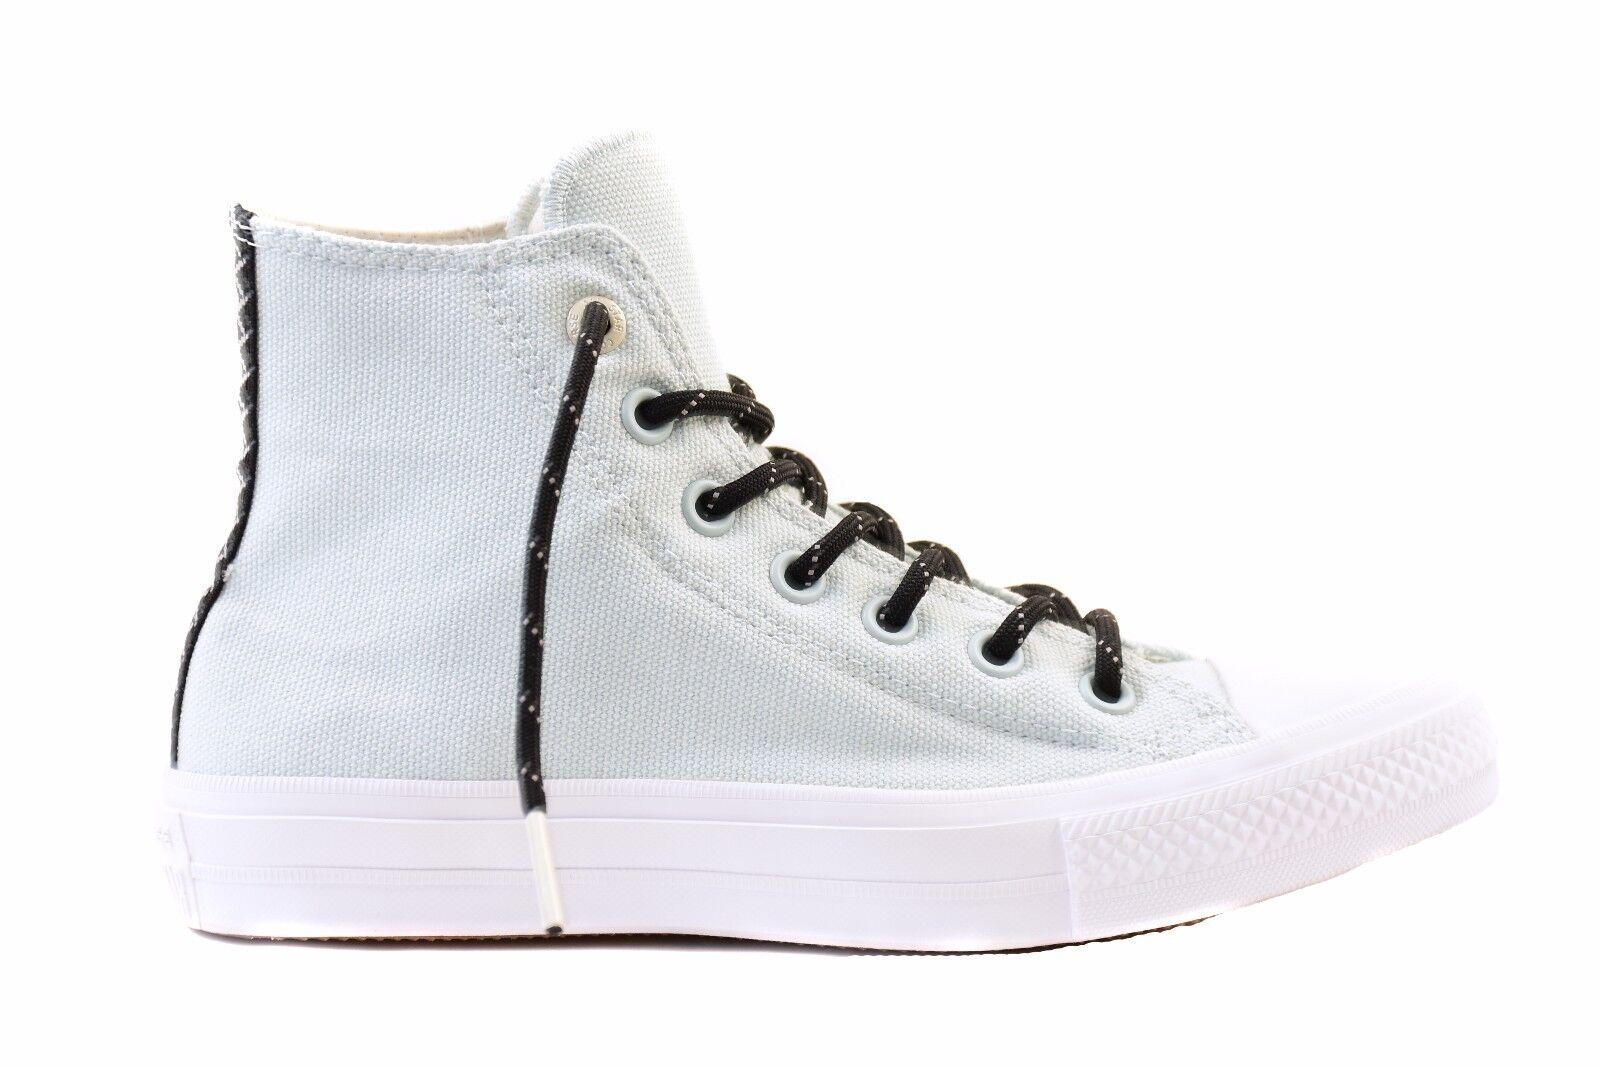 Converse Unisex CTAS II HI 154013C  Sneakers Polar Blau   154013C BCF78 f2b8bc